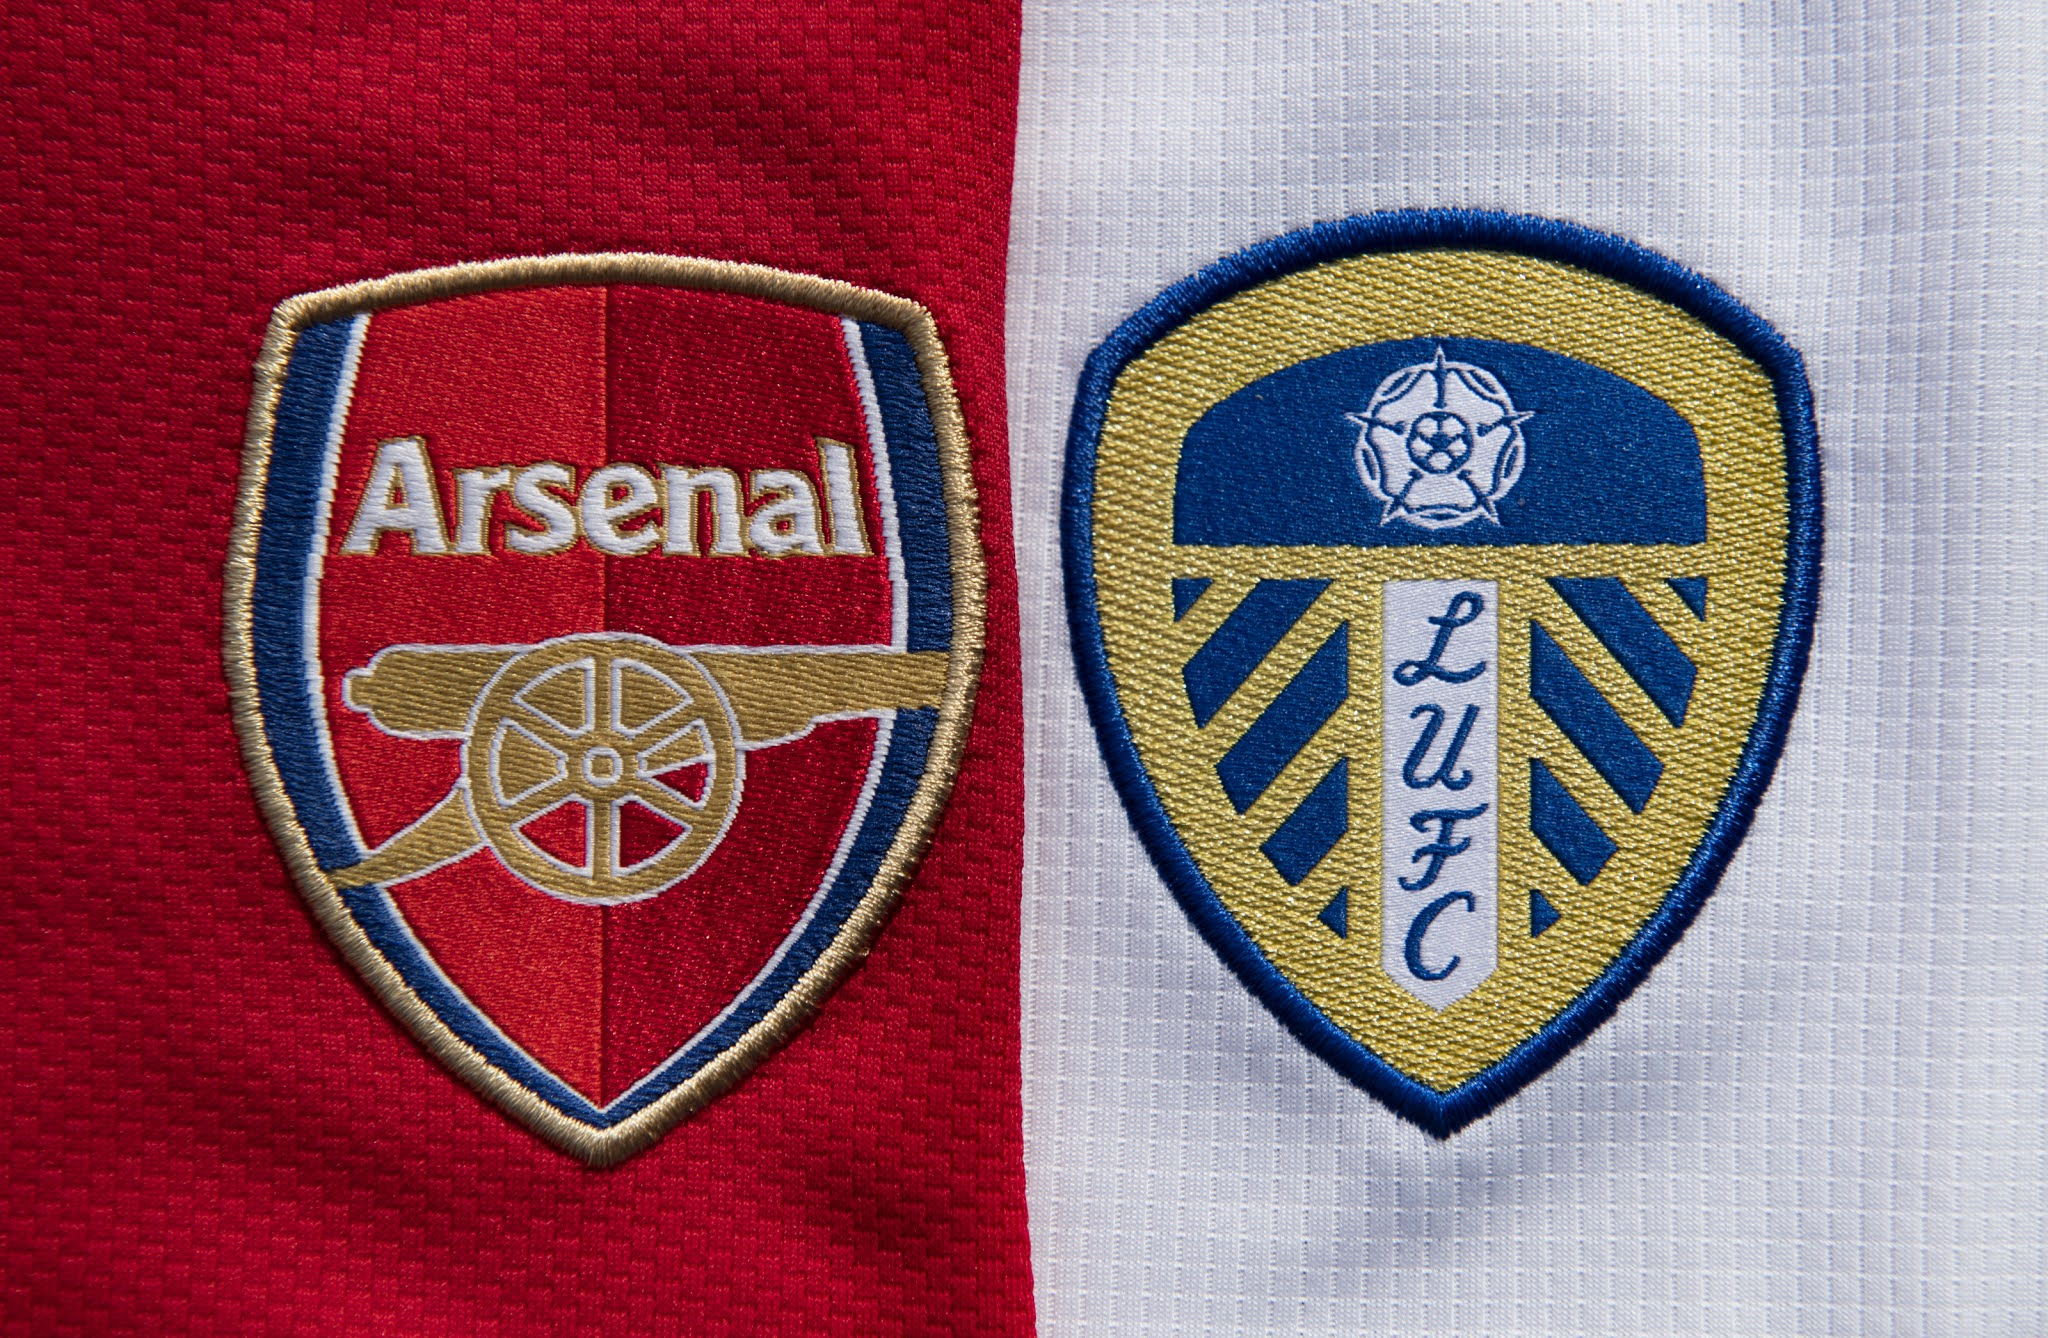 Arsenal vs Leeds United Match